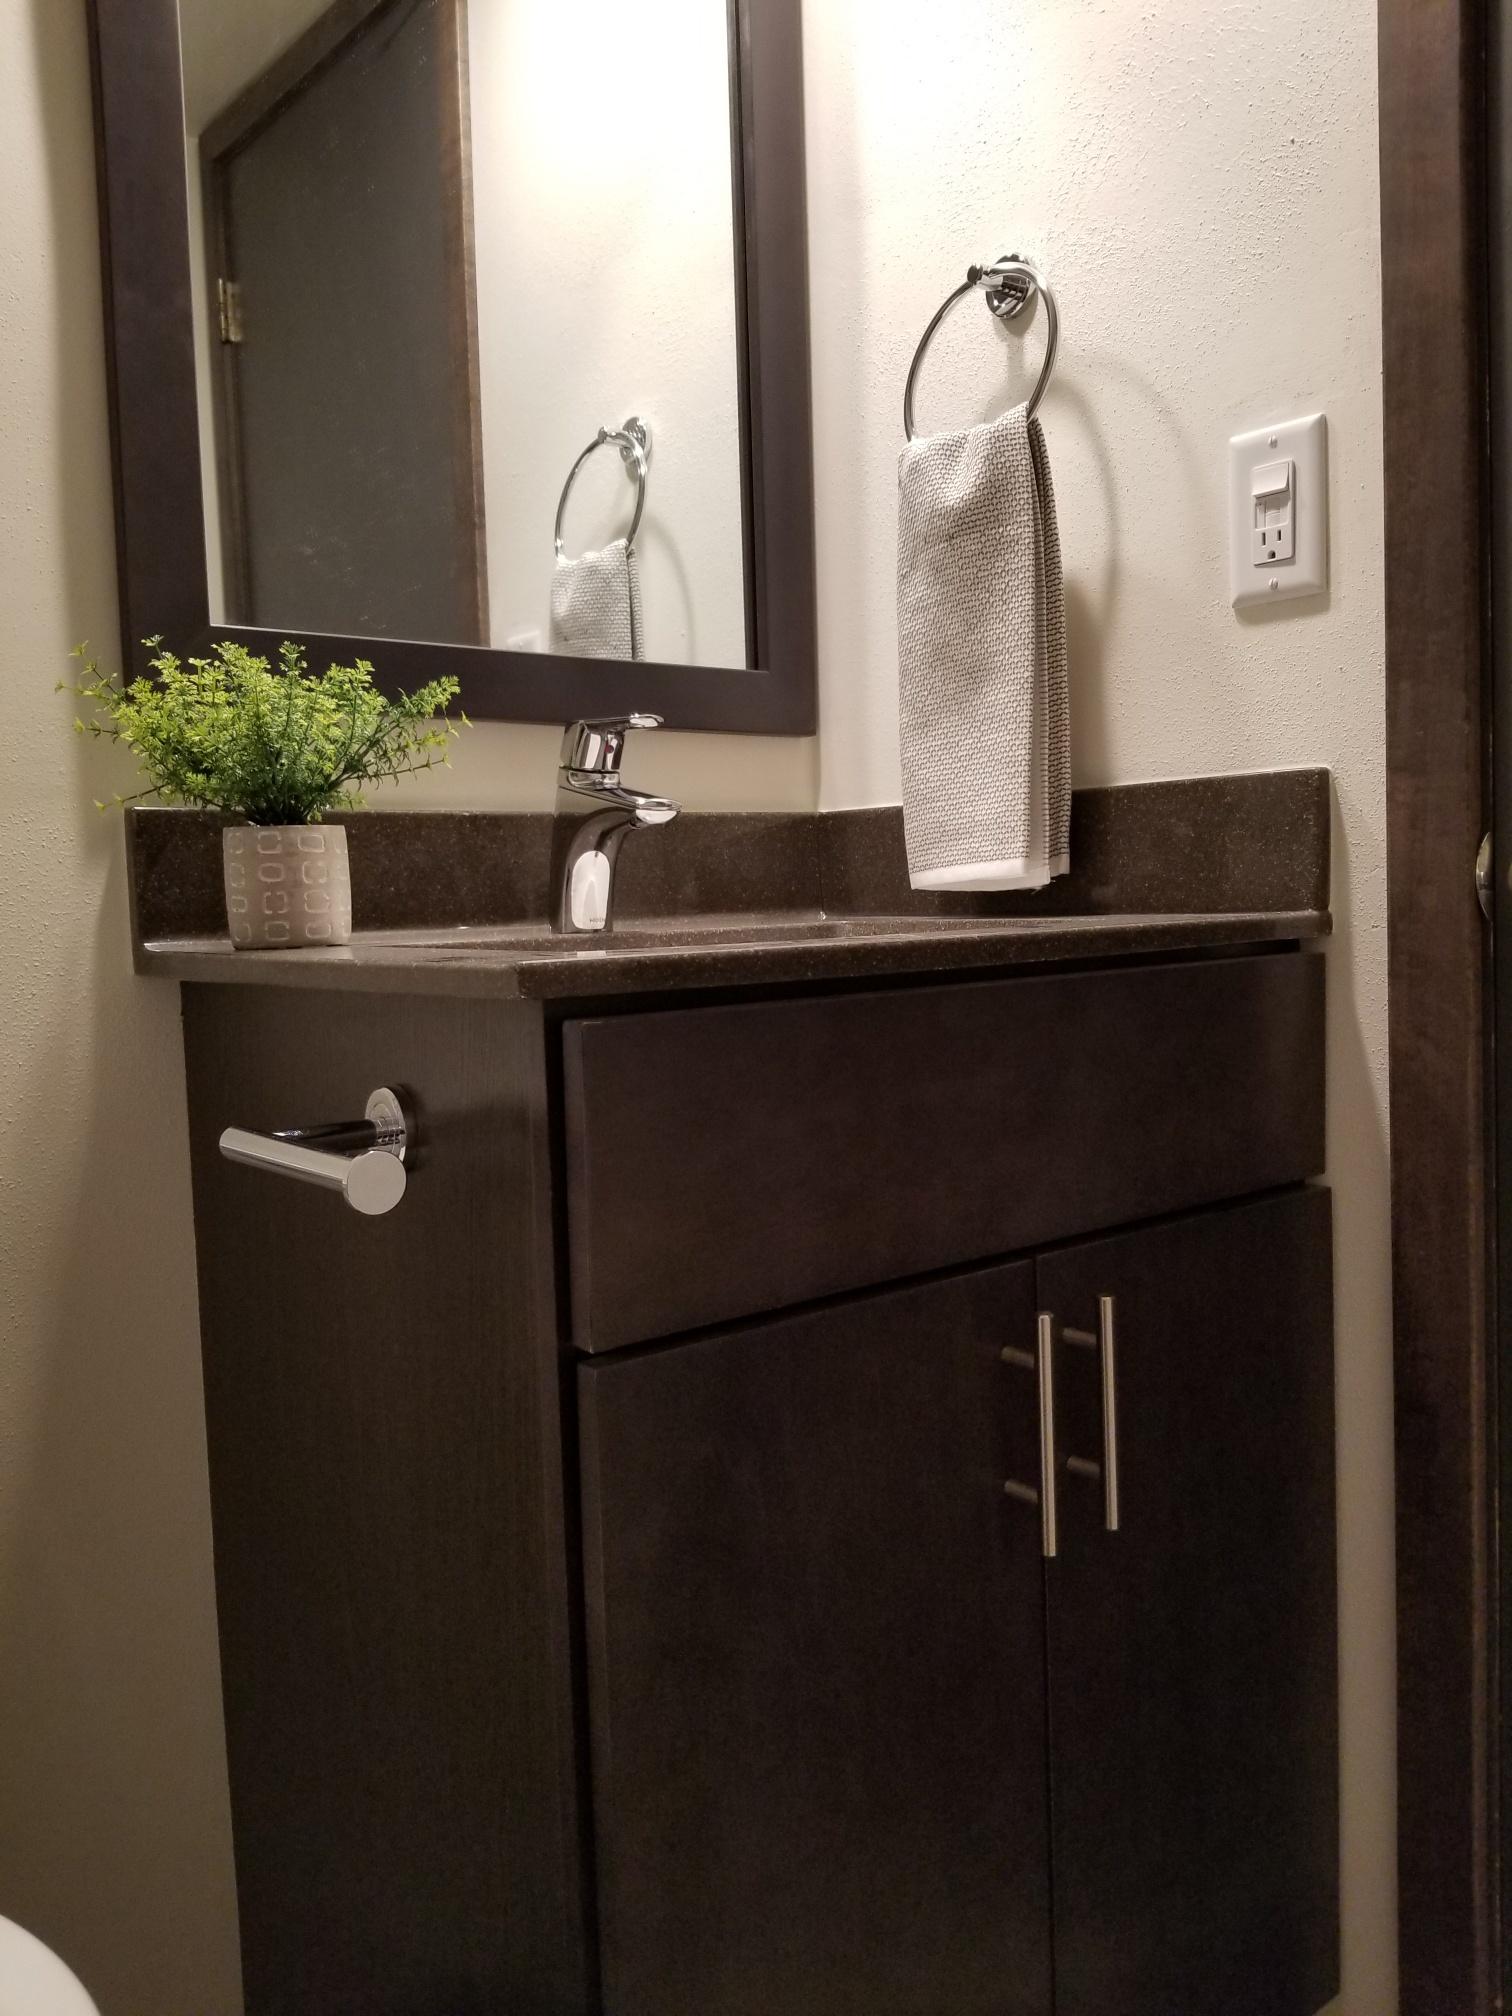 3939-805 full bath vanity 3.jpg